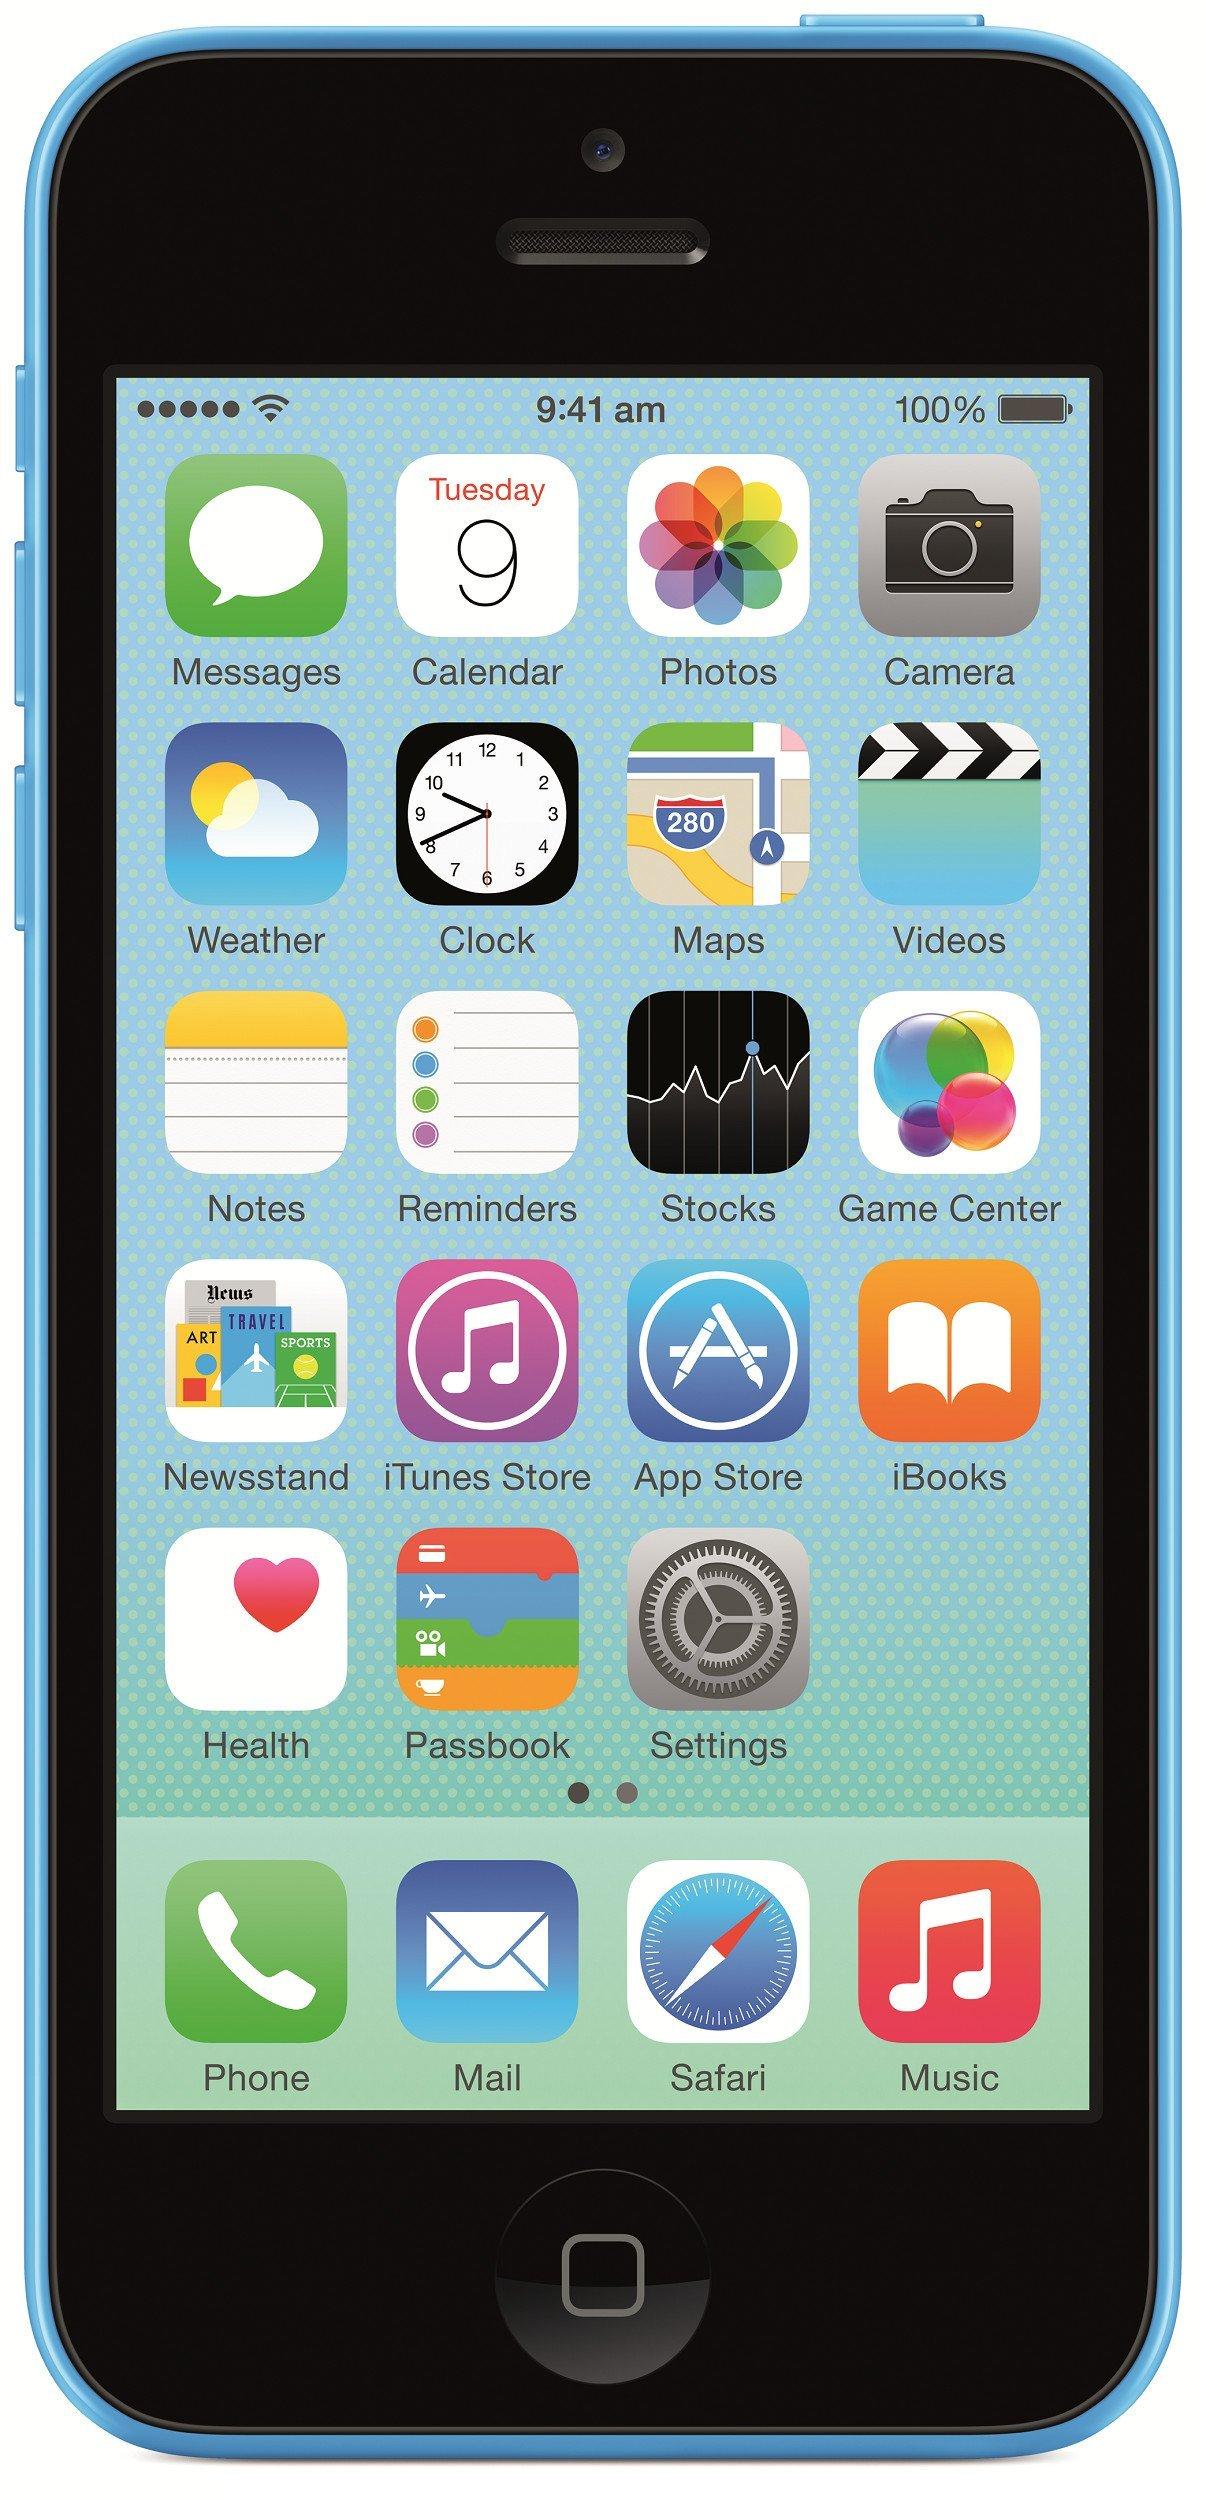 Apple iPhone 5c Factory Unlocked Cellphone, 8GB, Blue by Apple